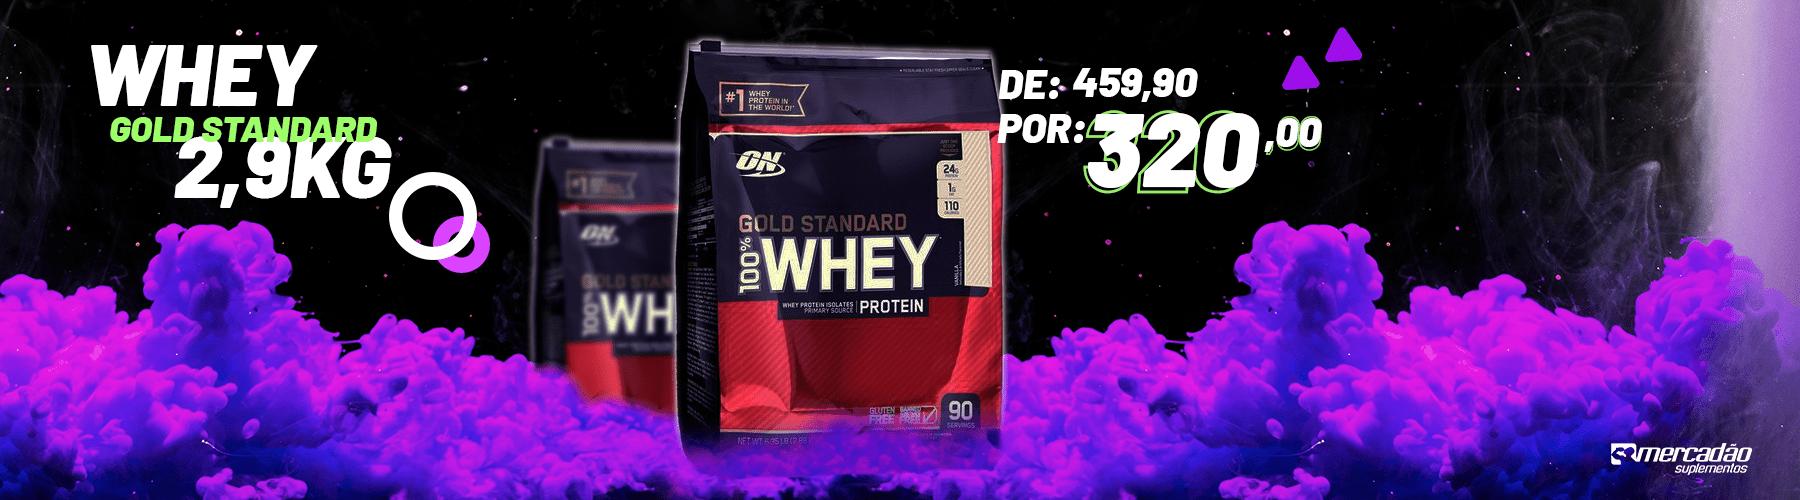 100% Whey REFIL 2,9kg